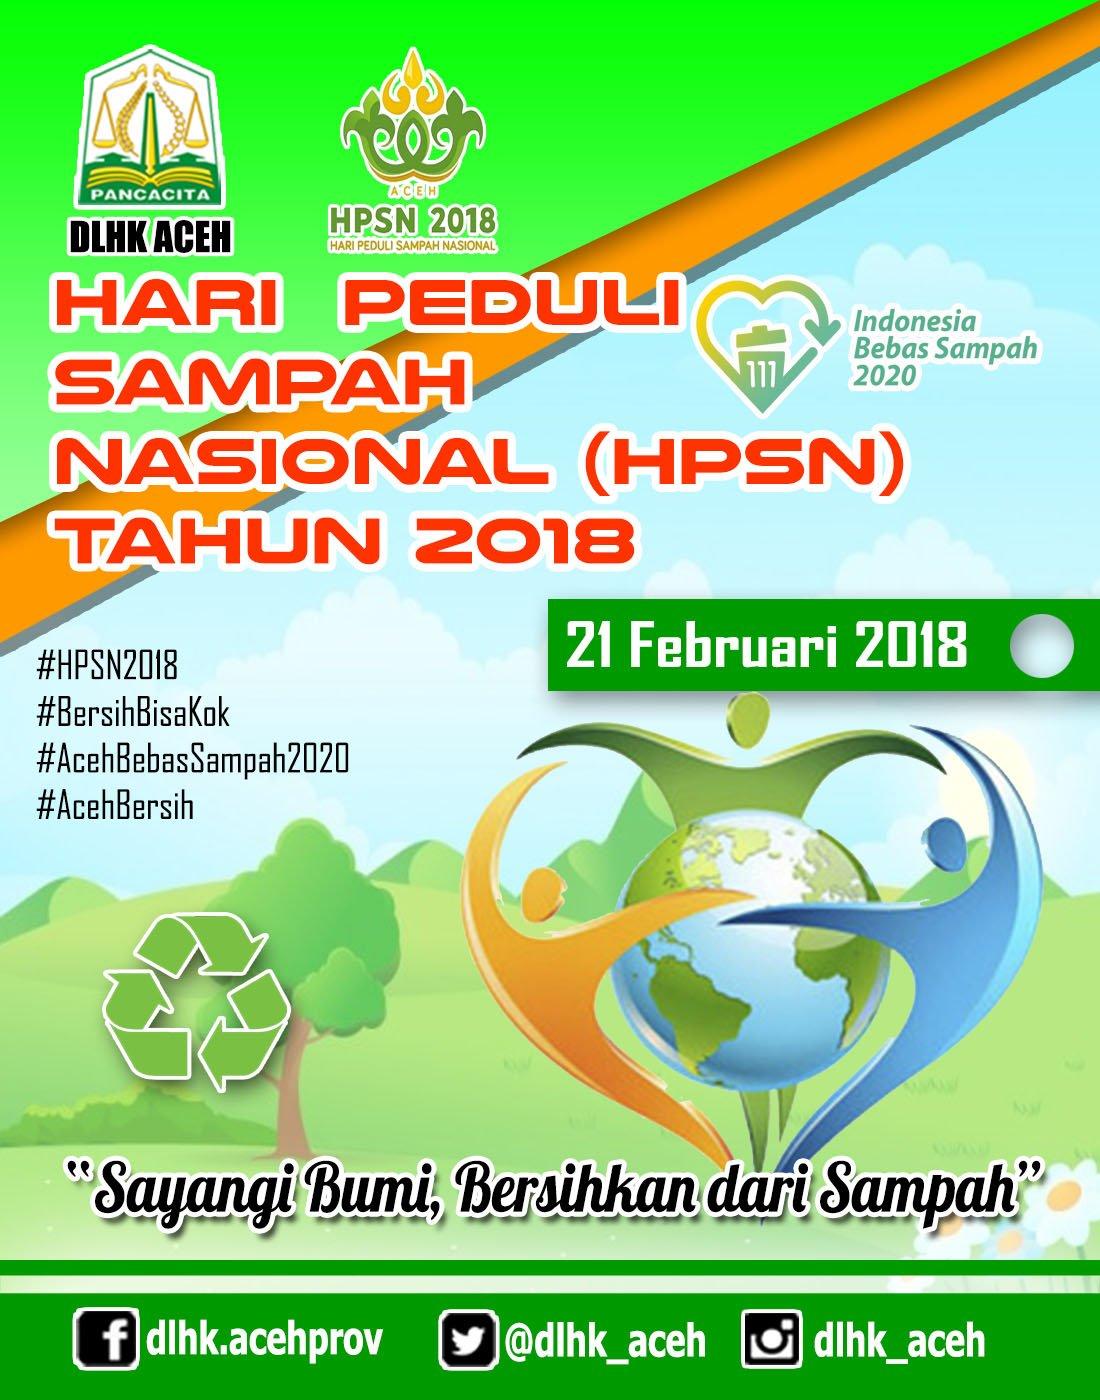 Dlhk Aceh On Twitter Hari Peduli Sampah Nasional Tahun 2018